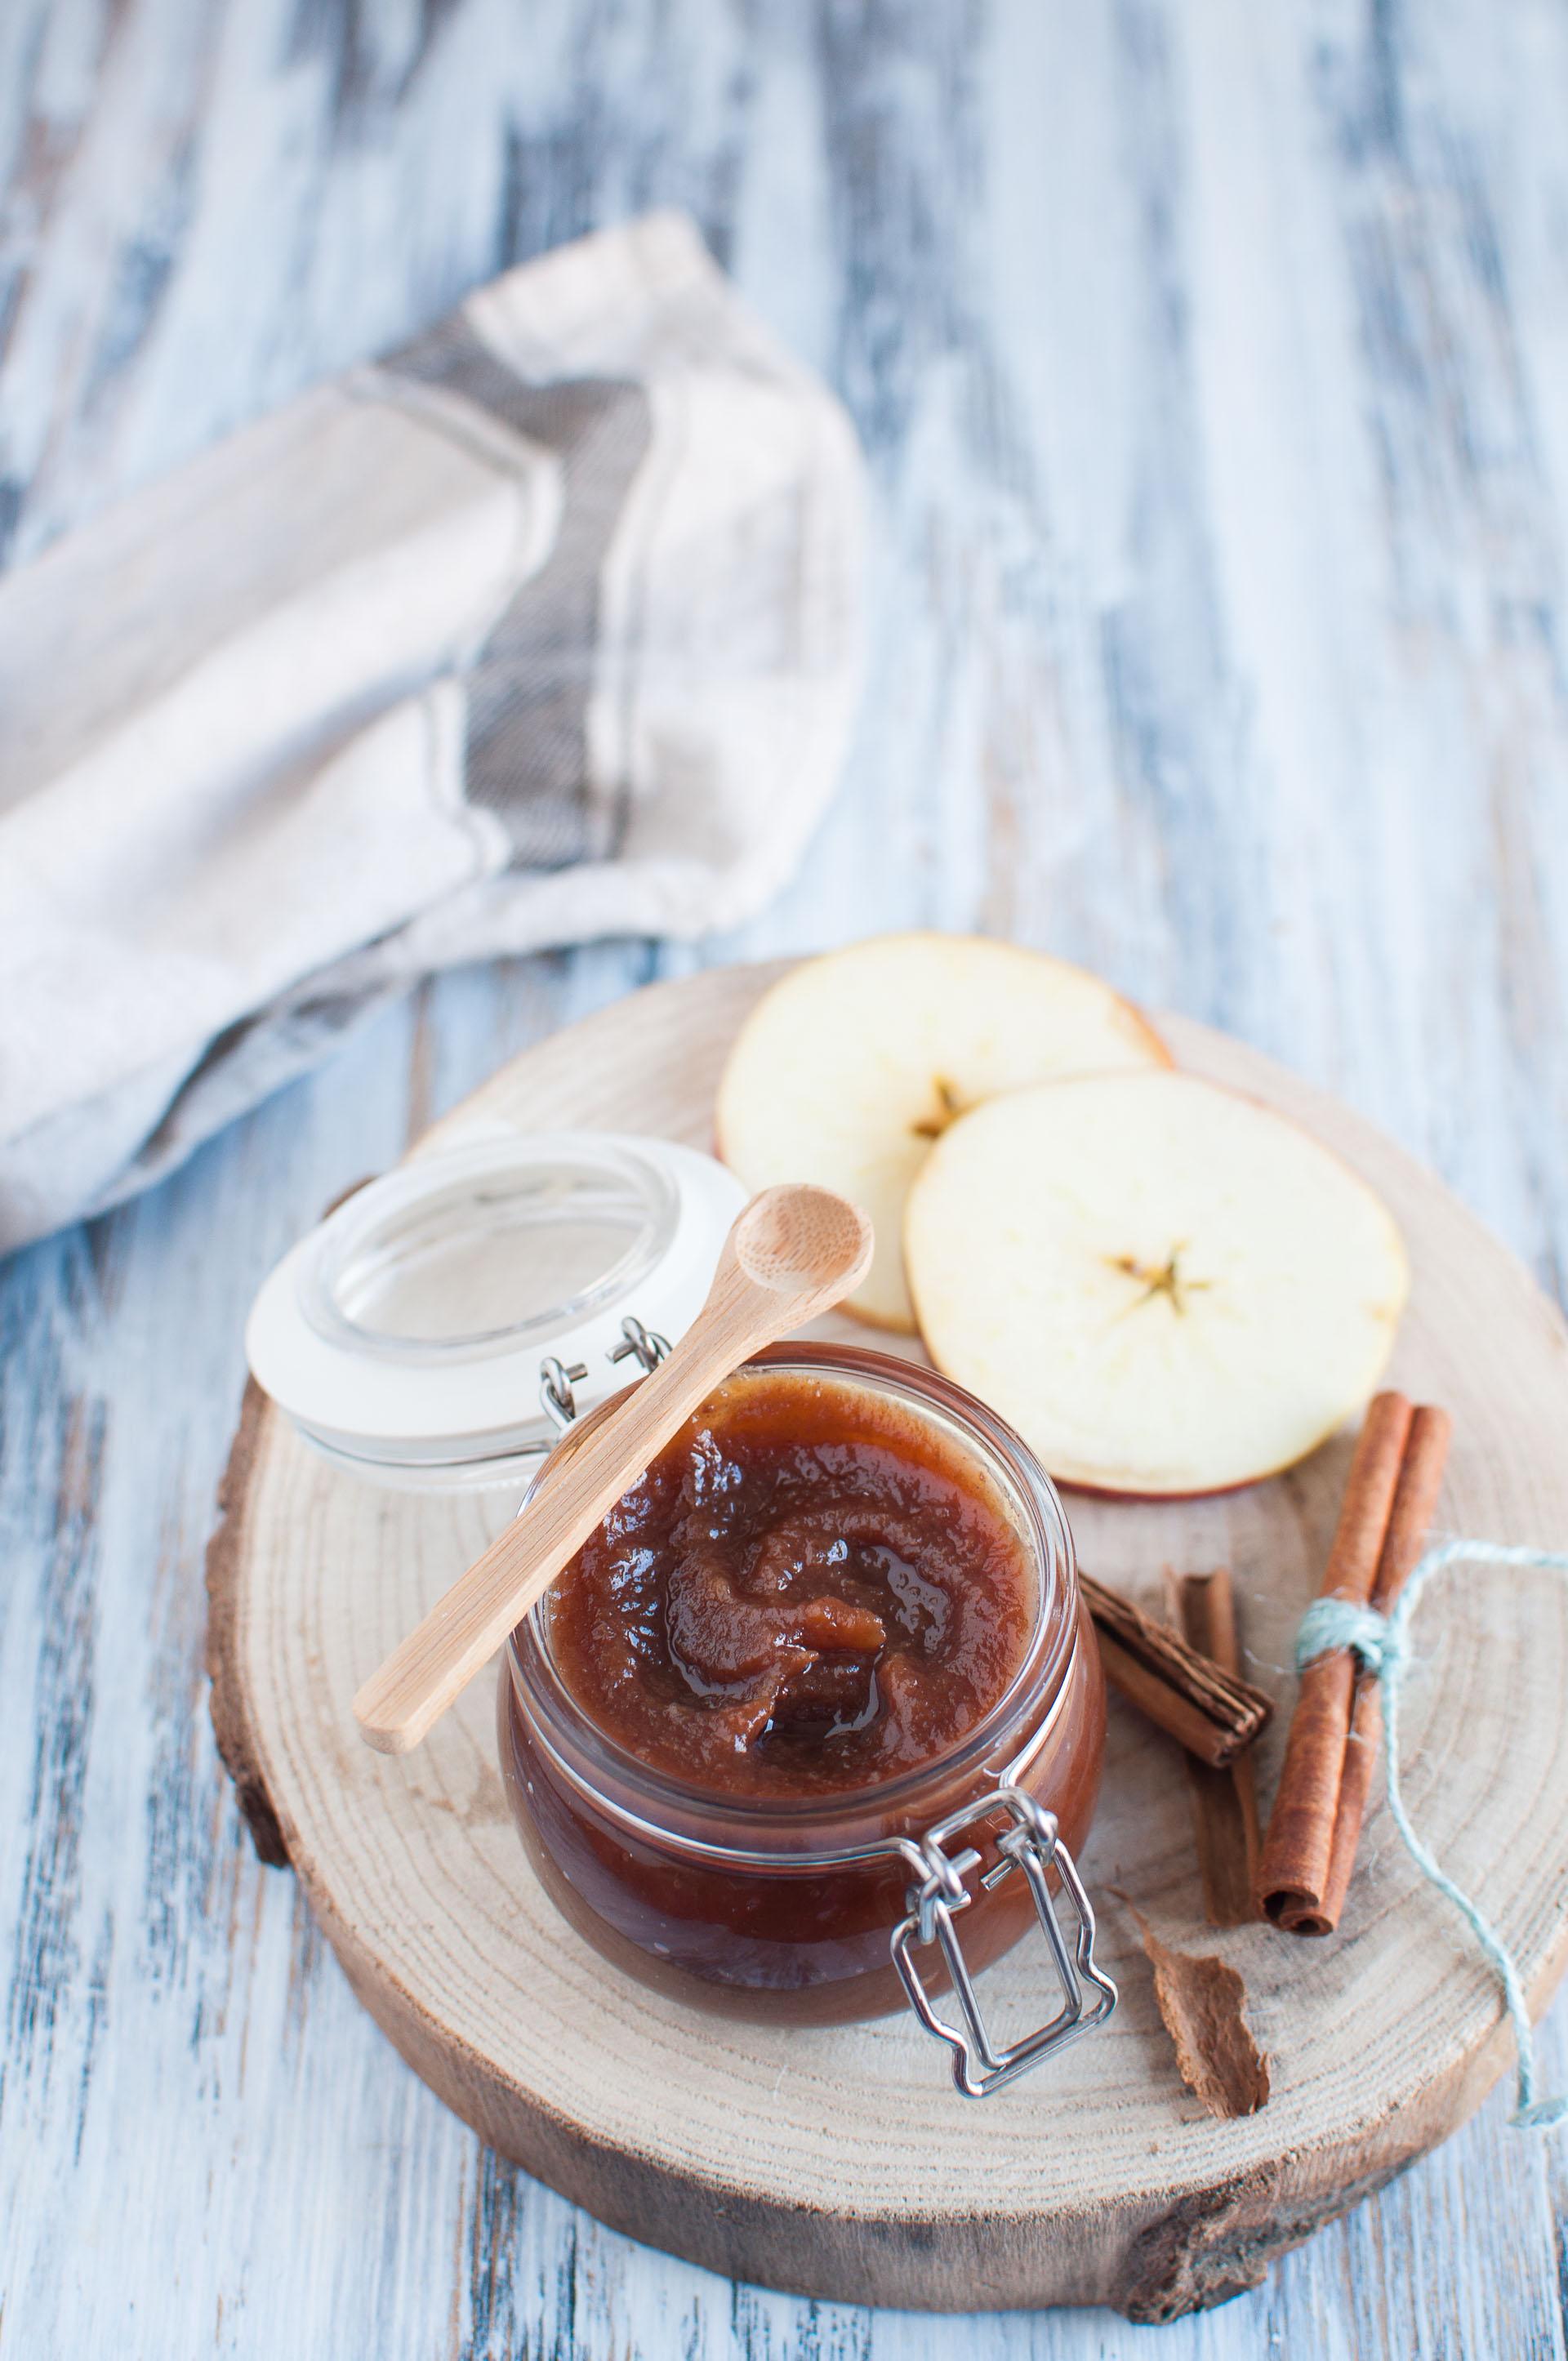 Apple butter ricetta burro di mele